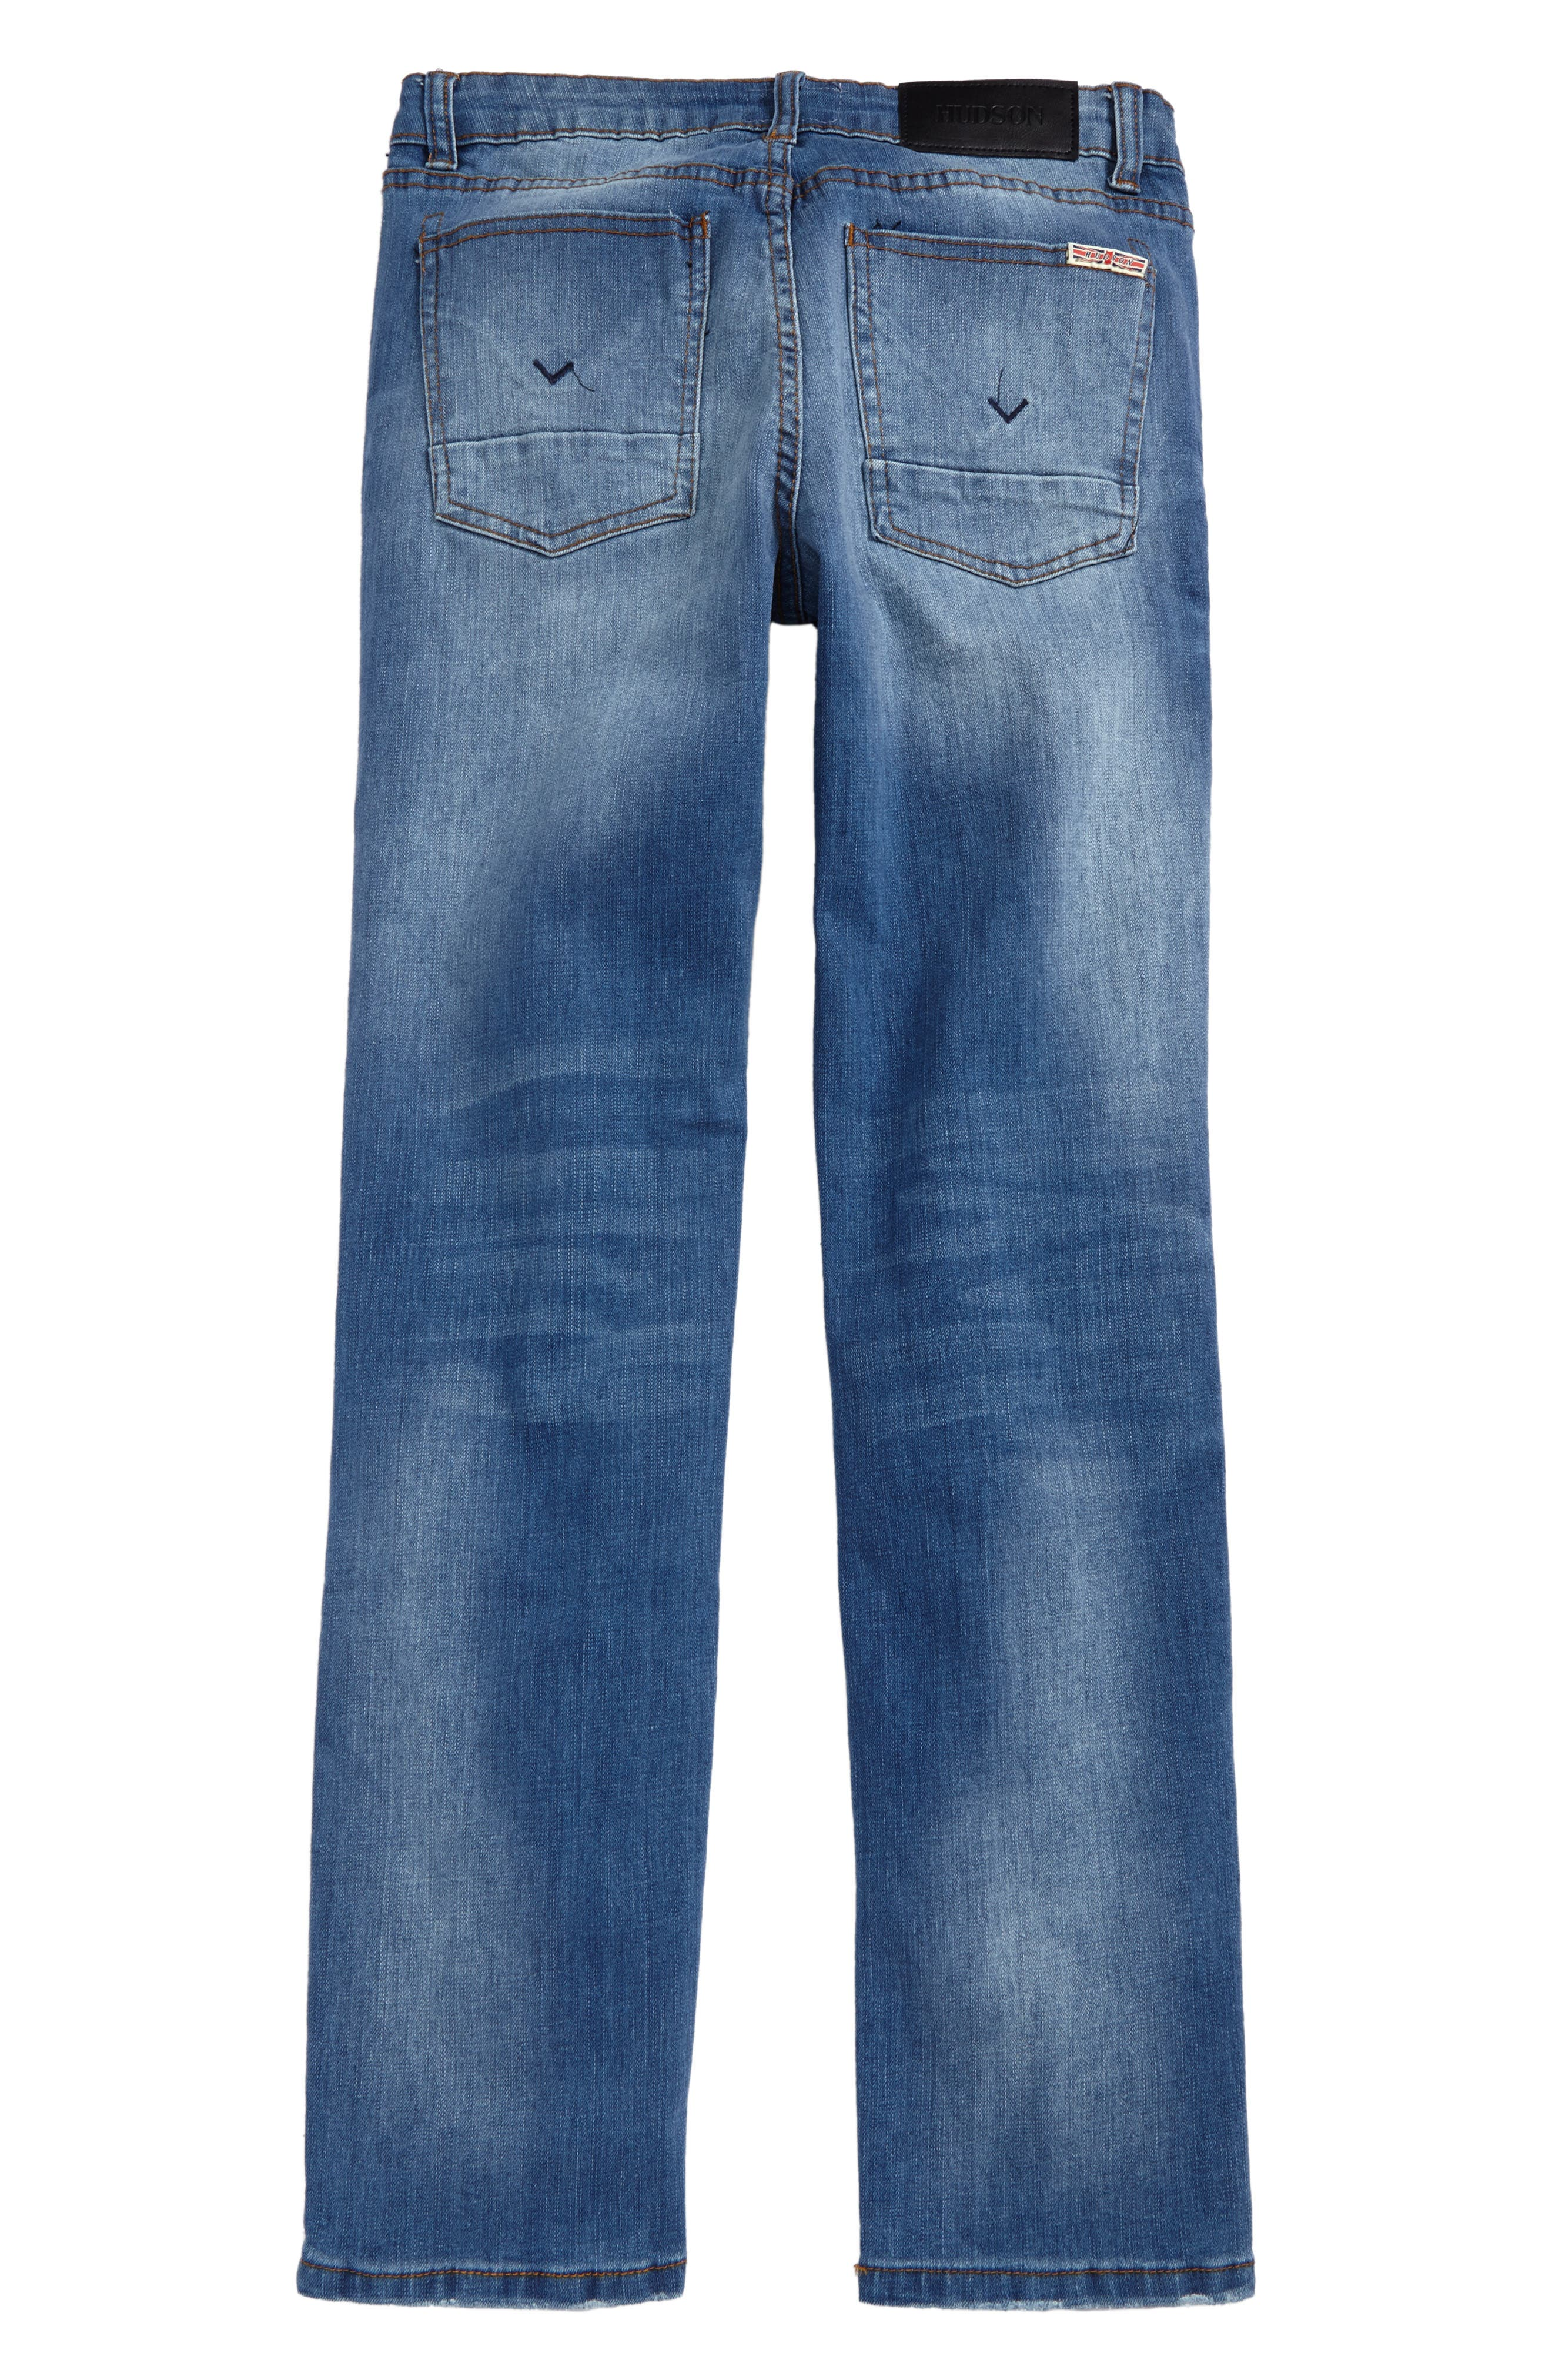 Alternate Image 2  - Hudson Kids Jagger Slim Fit Straight Leg Jeans (Big Boys)